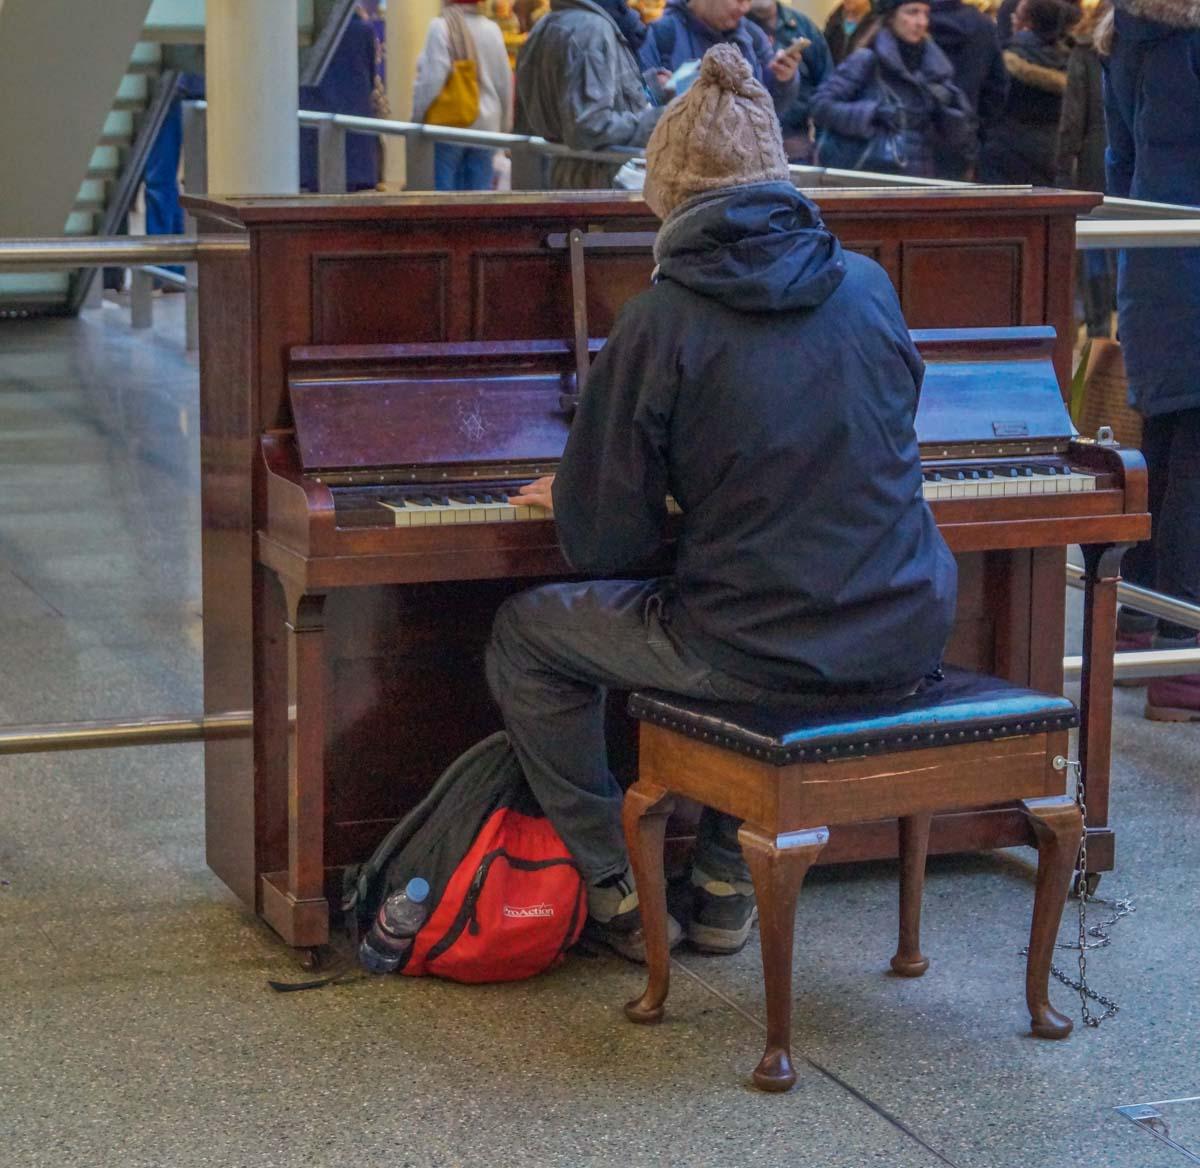 piano St Pancras International - Gateway to European Adventure